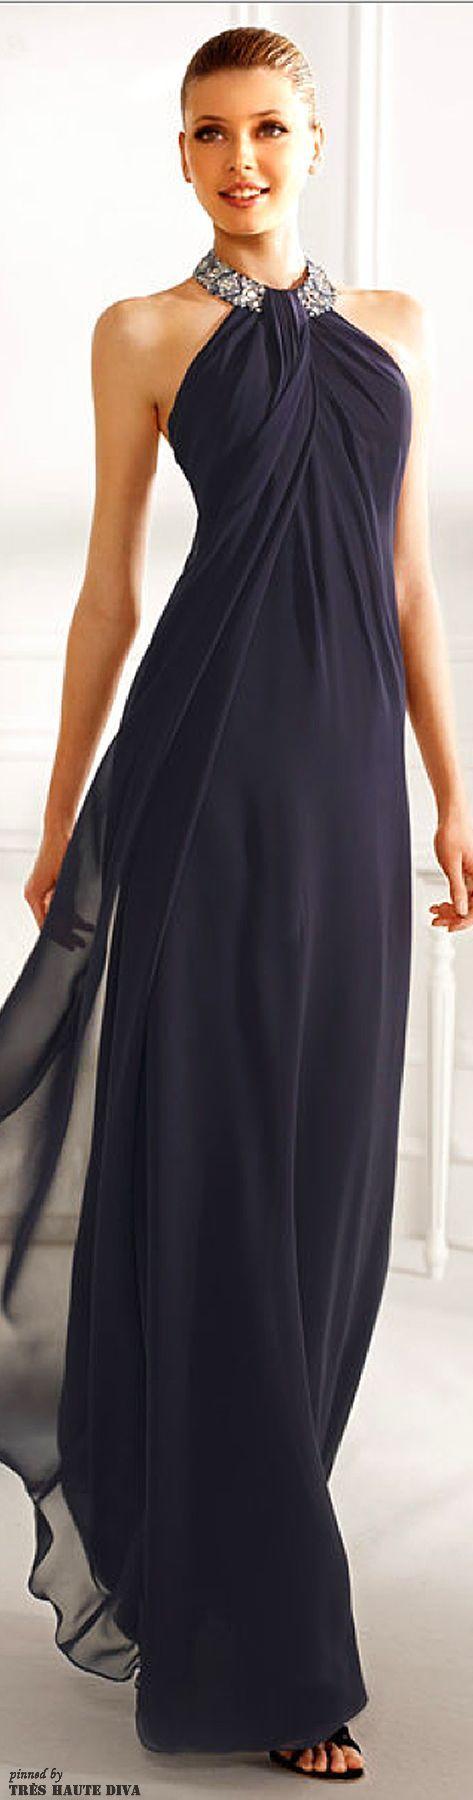 goodliness  prom #handmade #dresses long 2016 unique prom night dress 2017